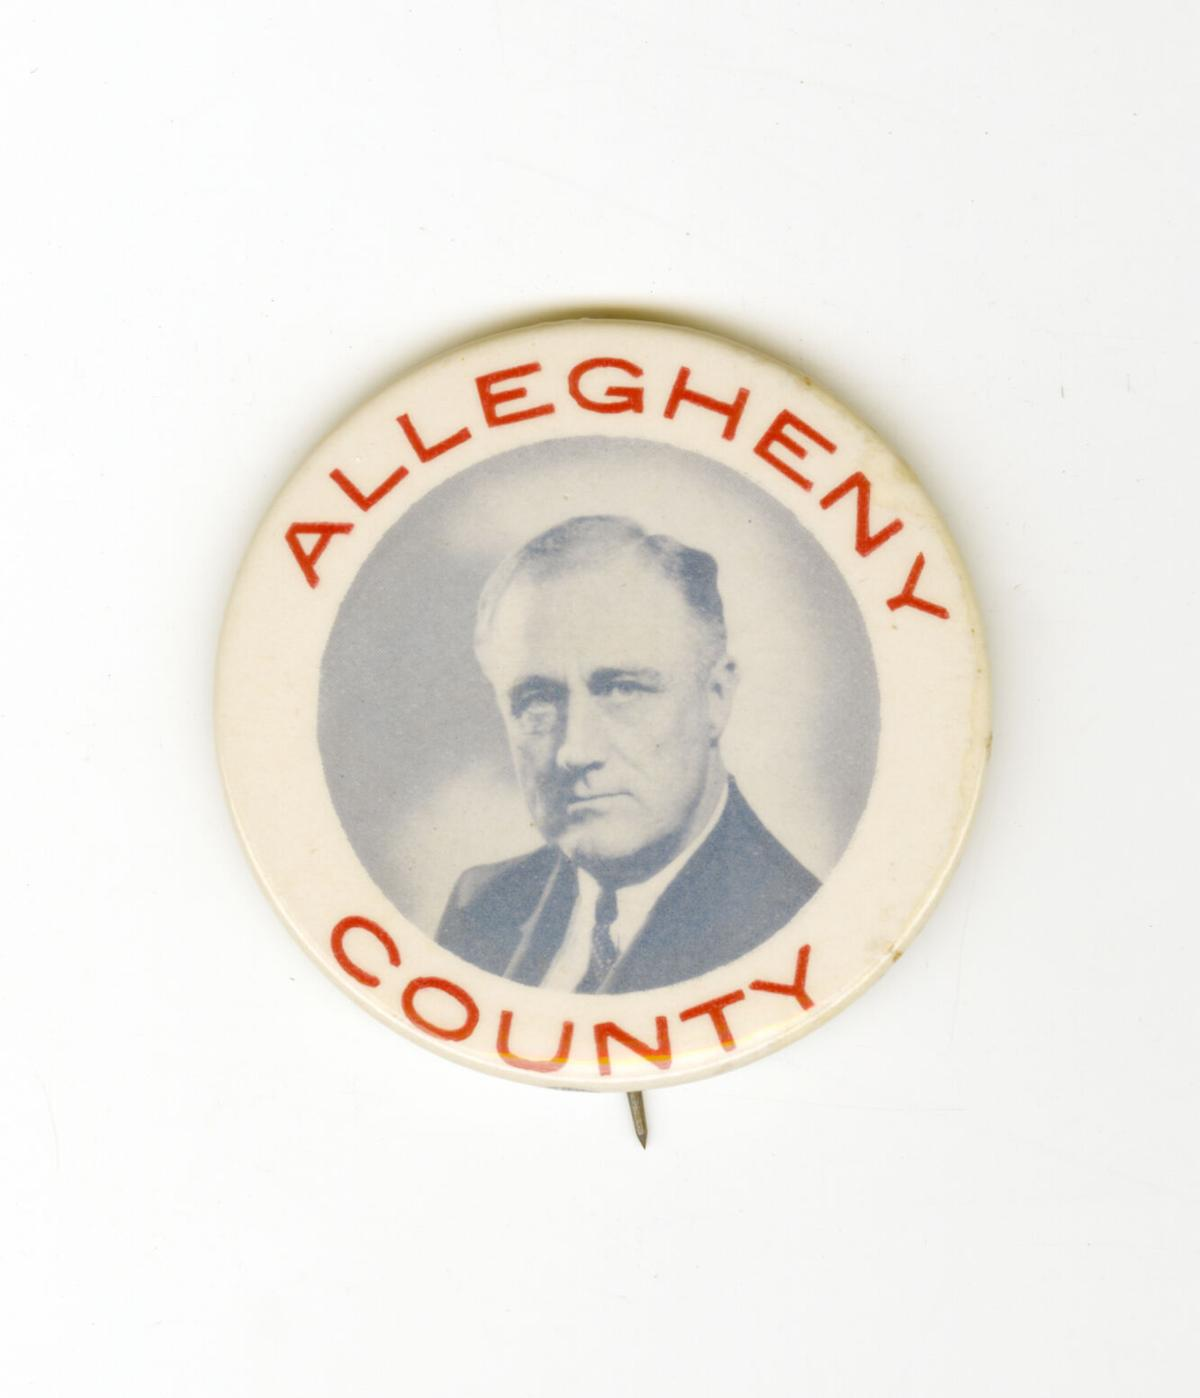 20210402_com_FDR Allegheny County button (1).jpg